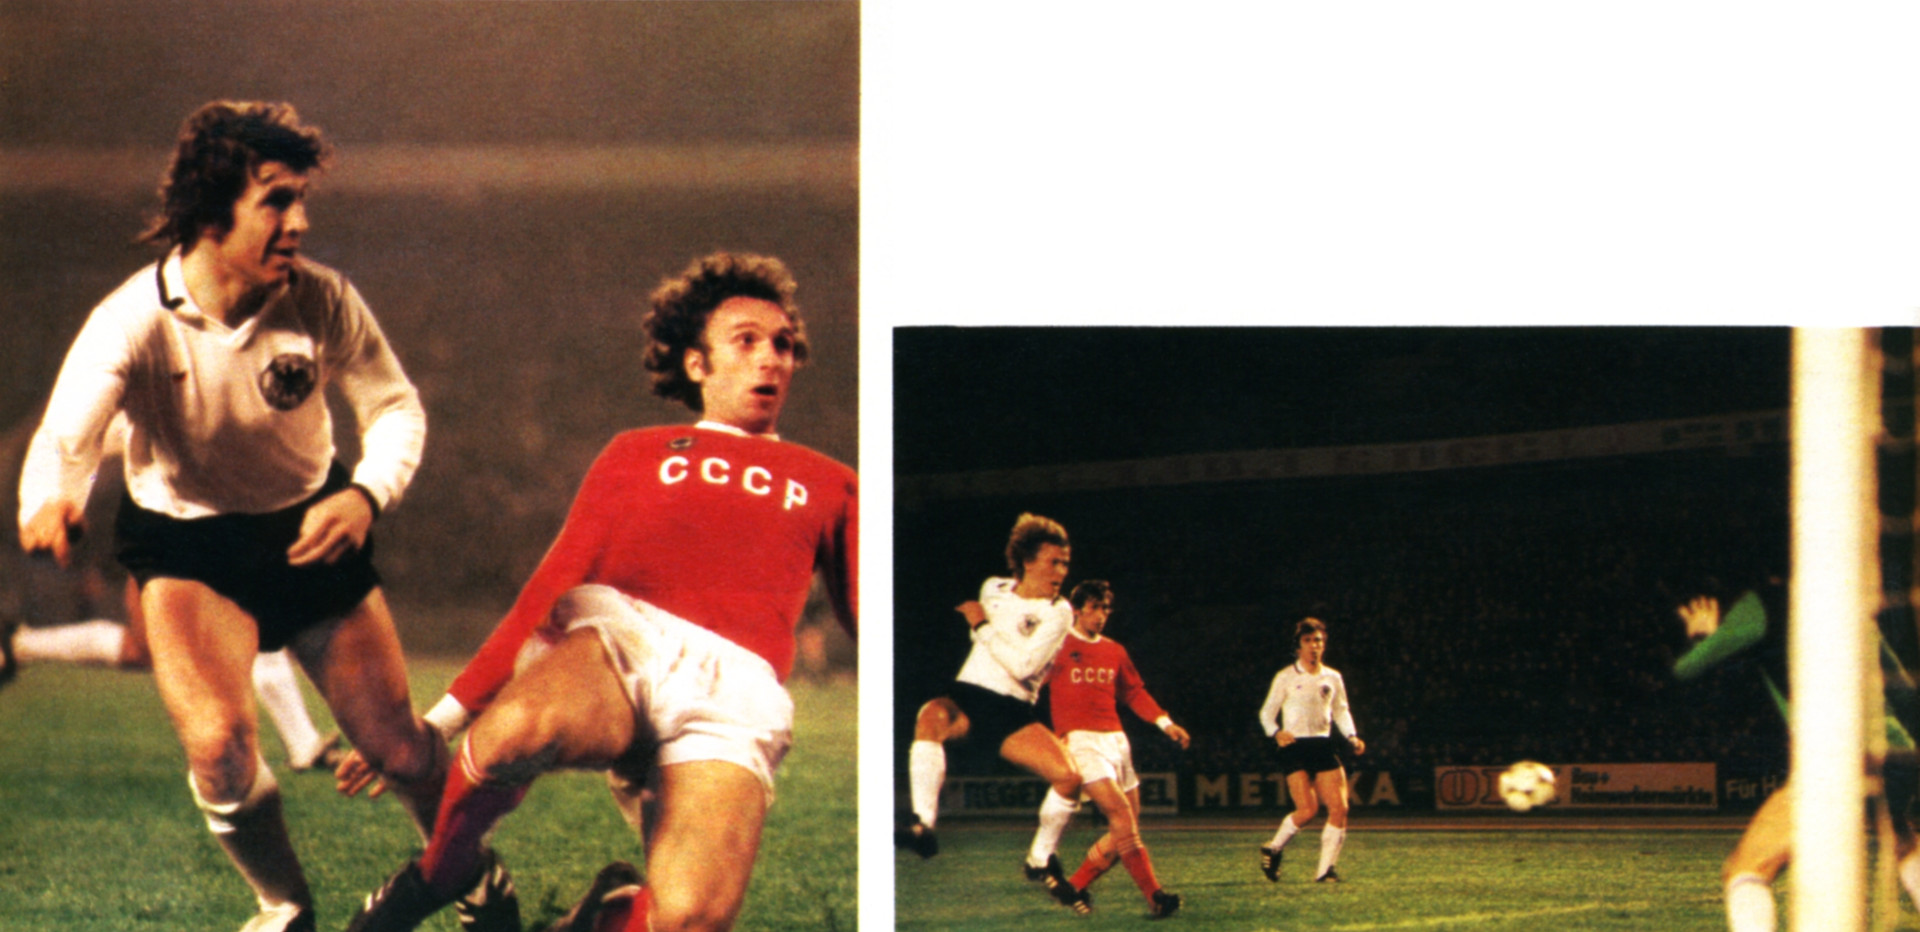 USSR-Mirzoyan-13.jpg